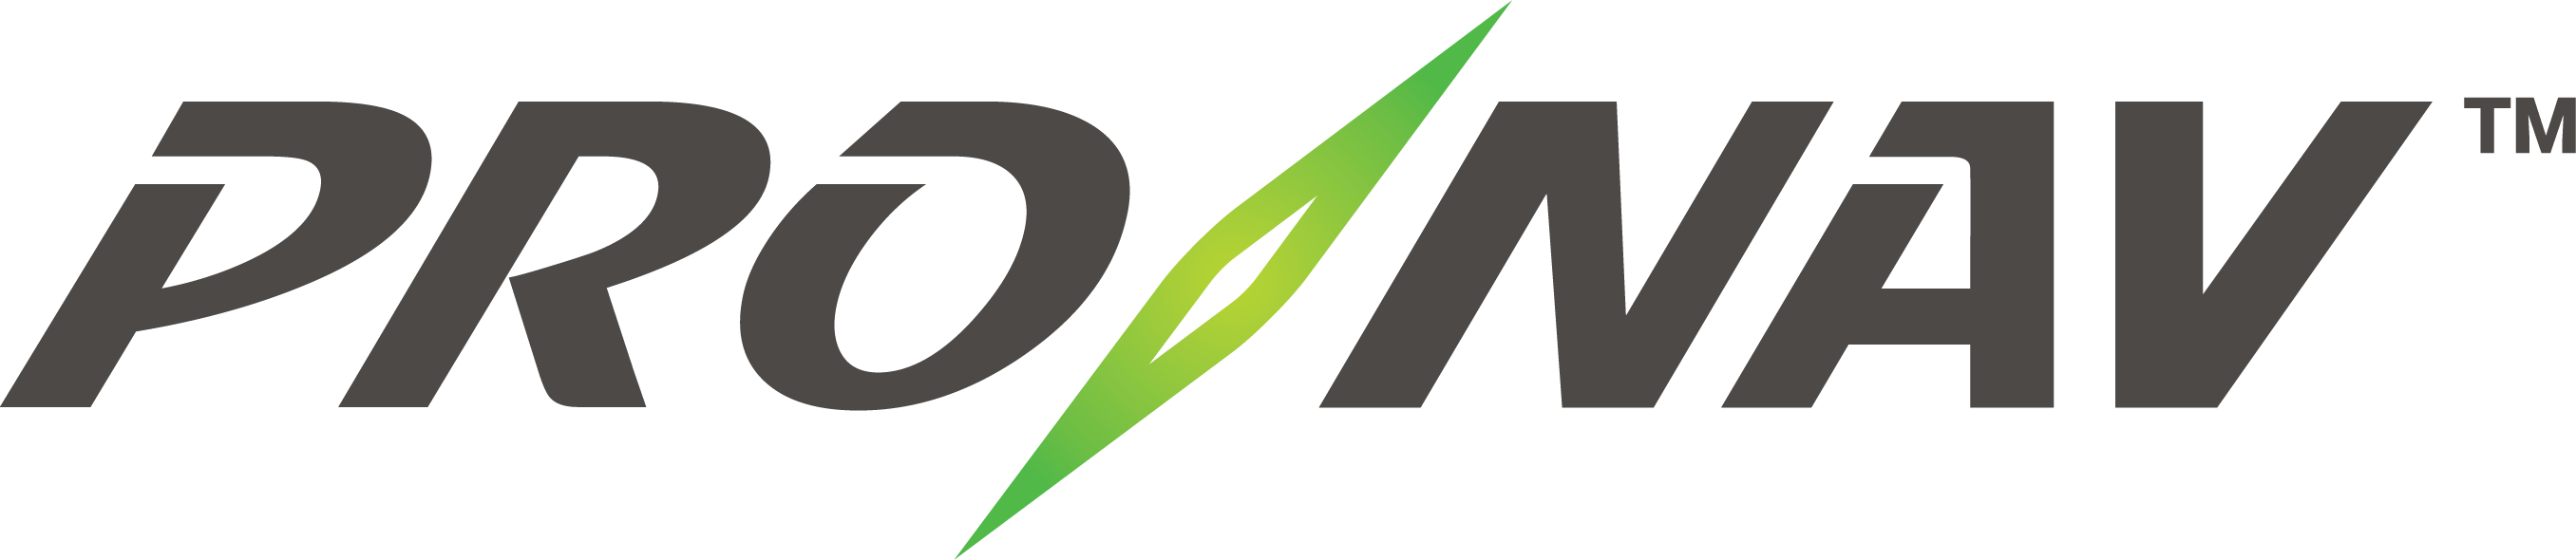 ProNav logo